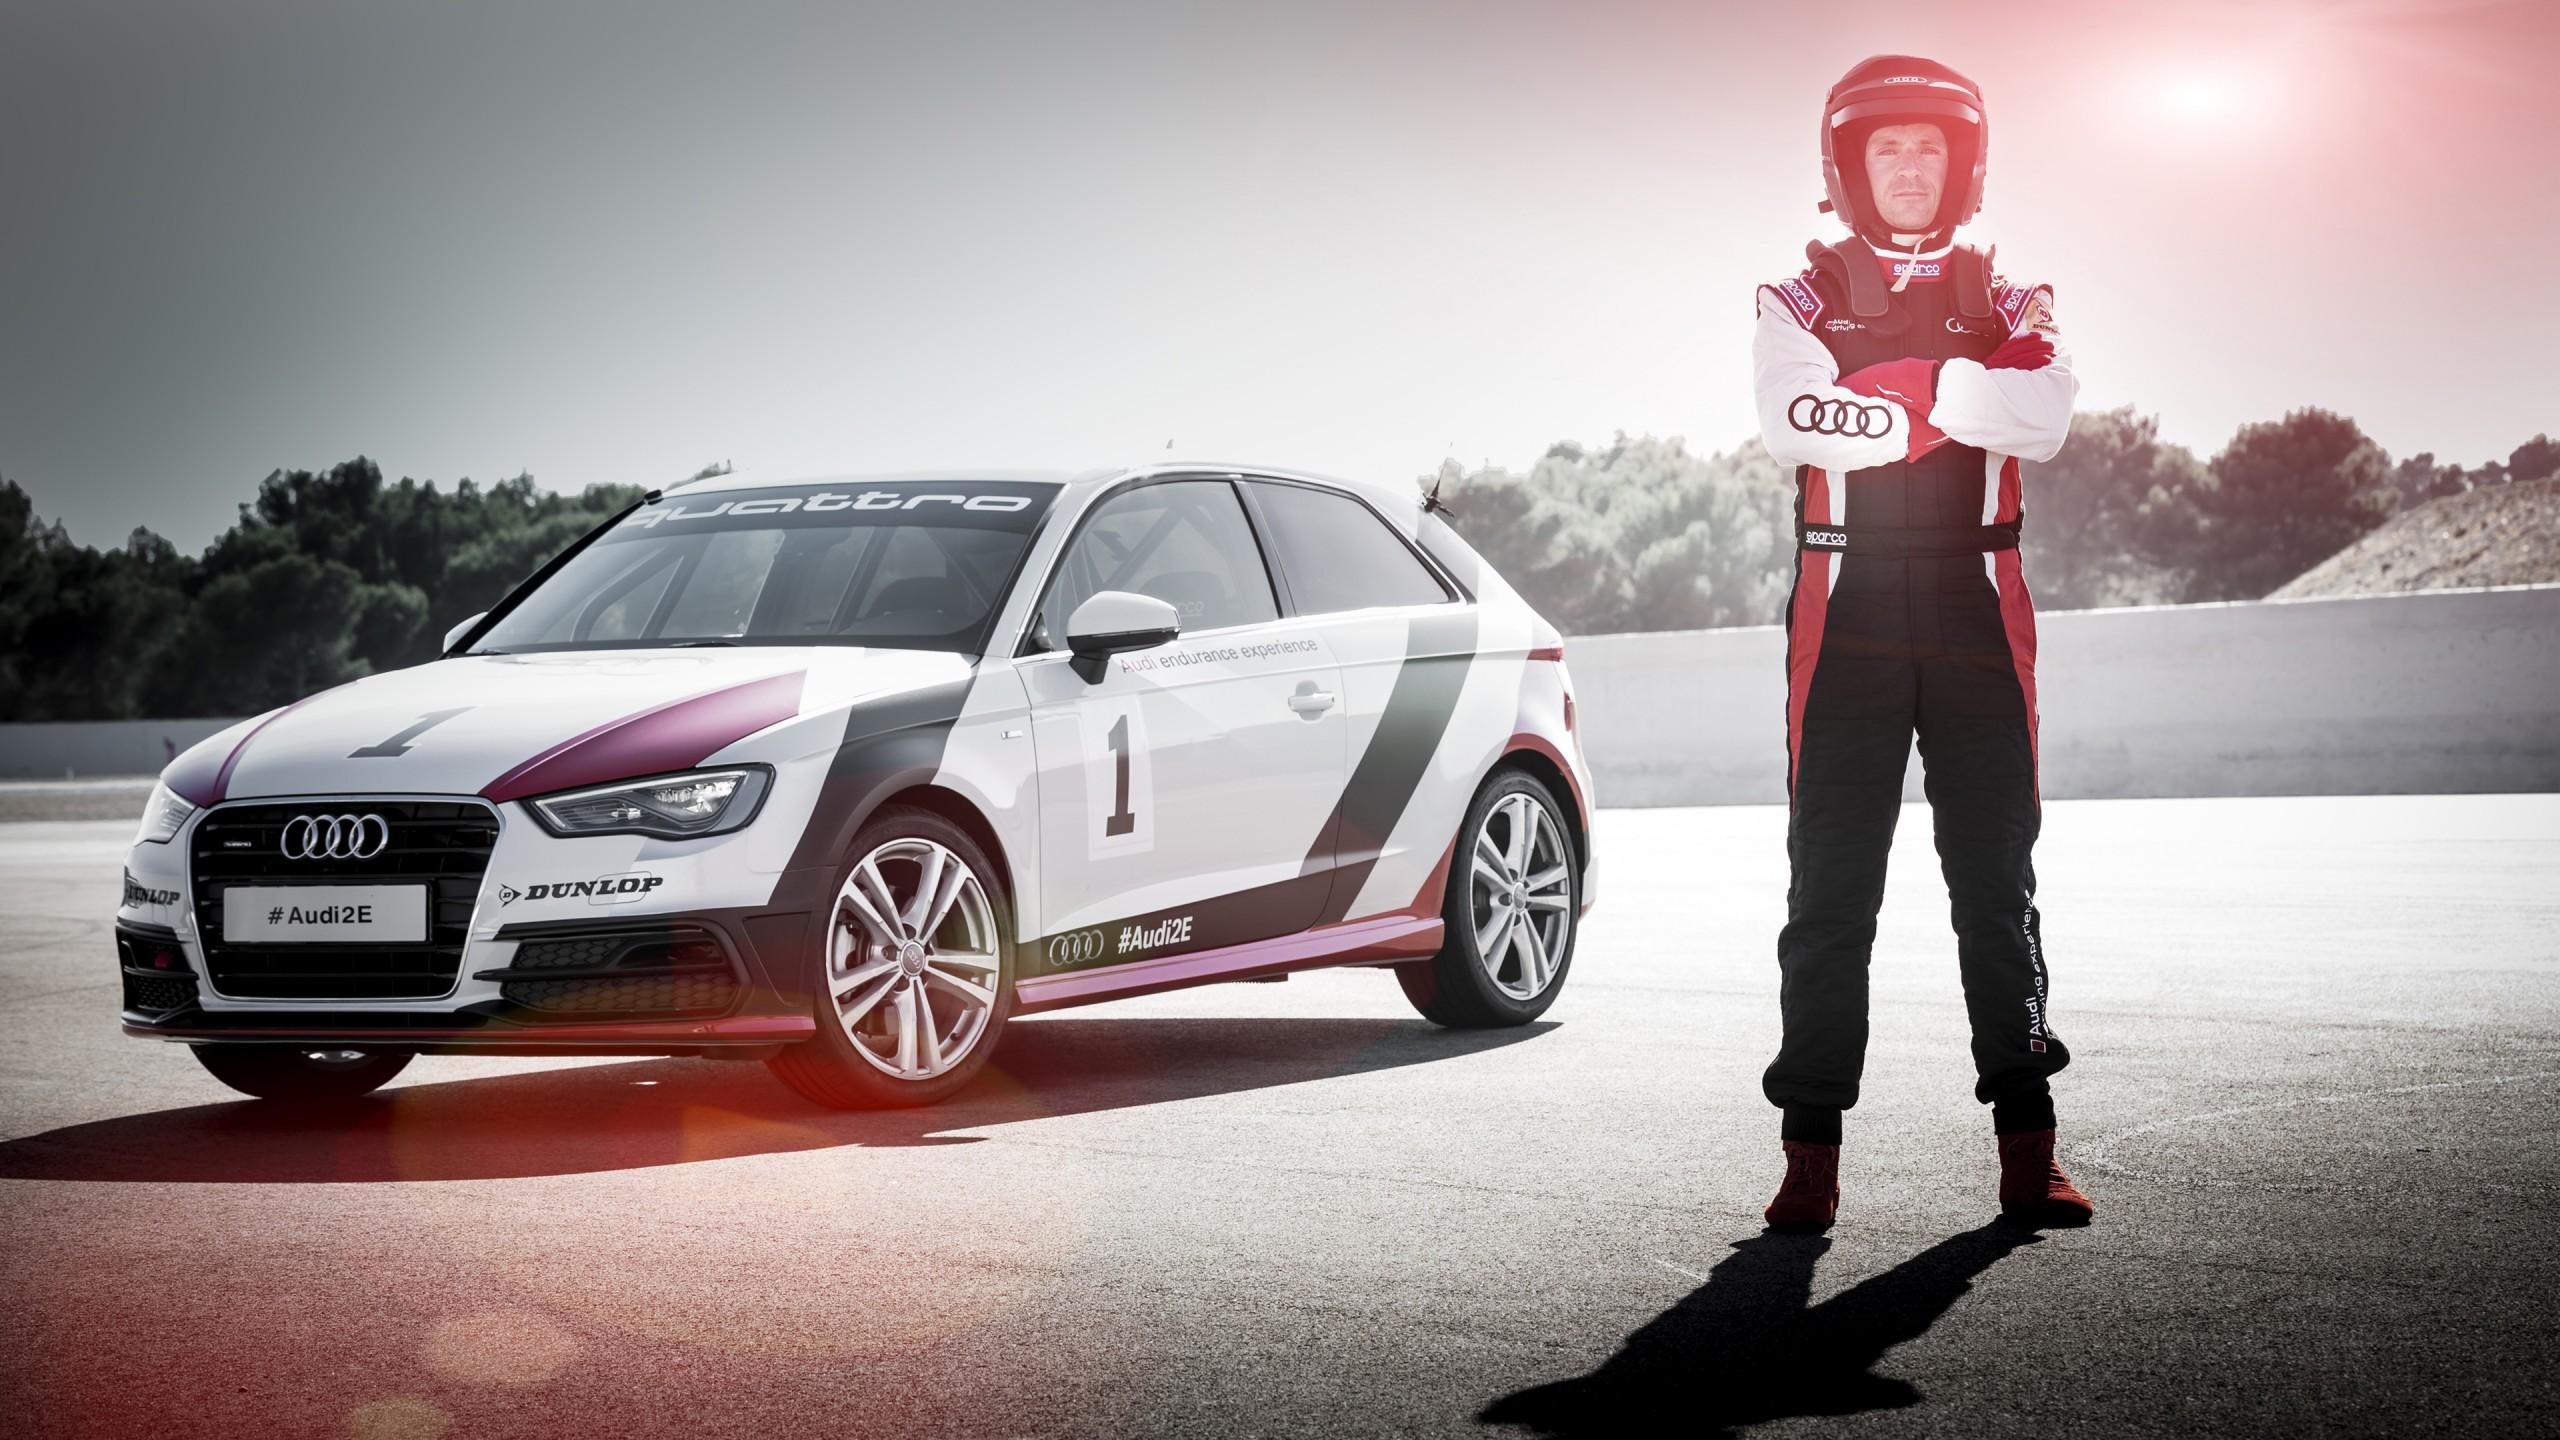 2017 Audi R8 Iphone Wallpaper 2017 Audi A3 Sportback Wallpaper Hd Car Wallpapers Id